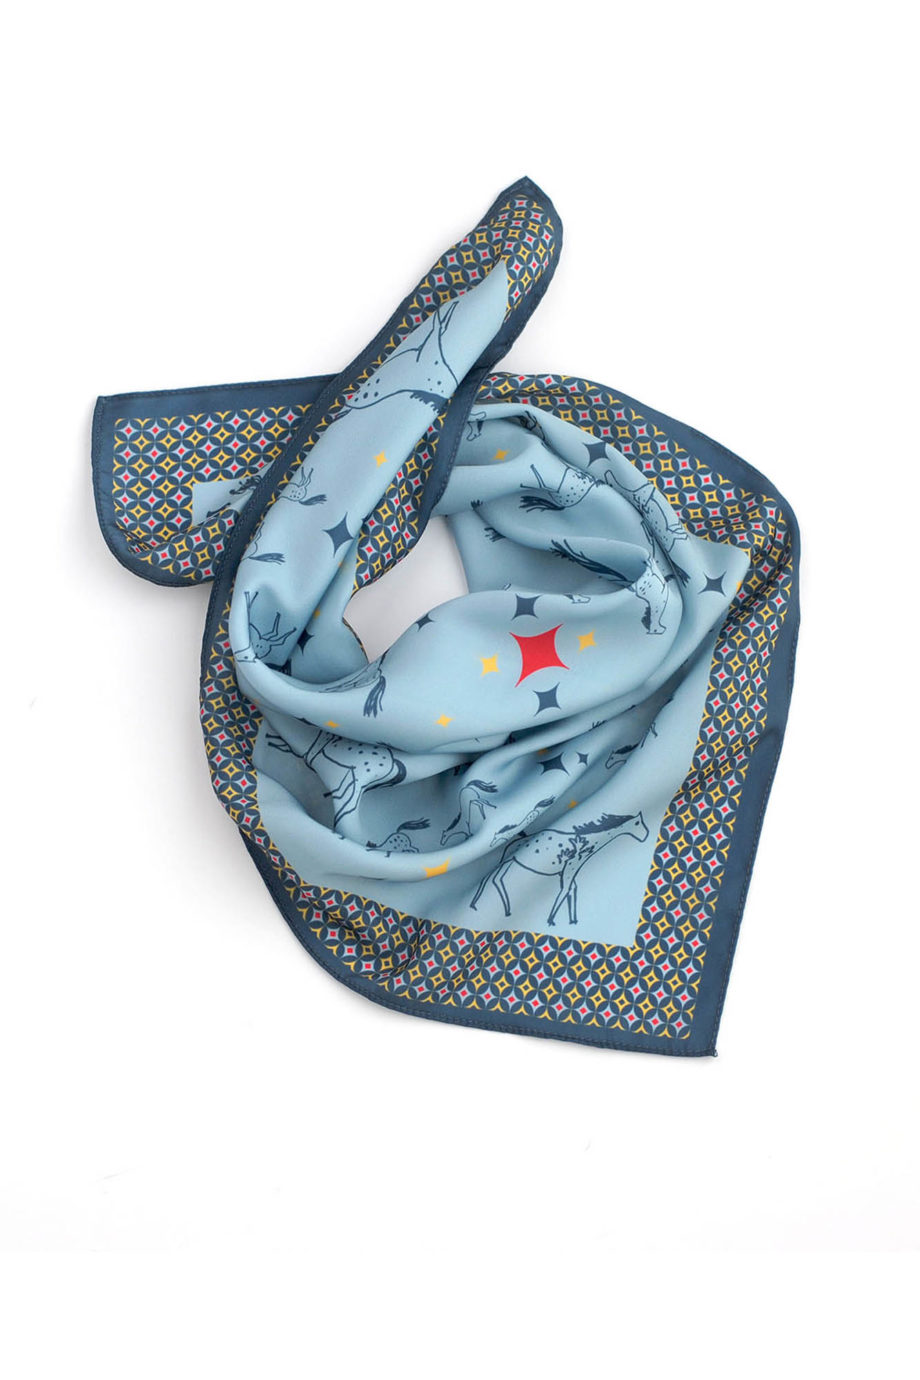 maria-kent-studio-pañuelo-horses-azul